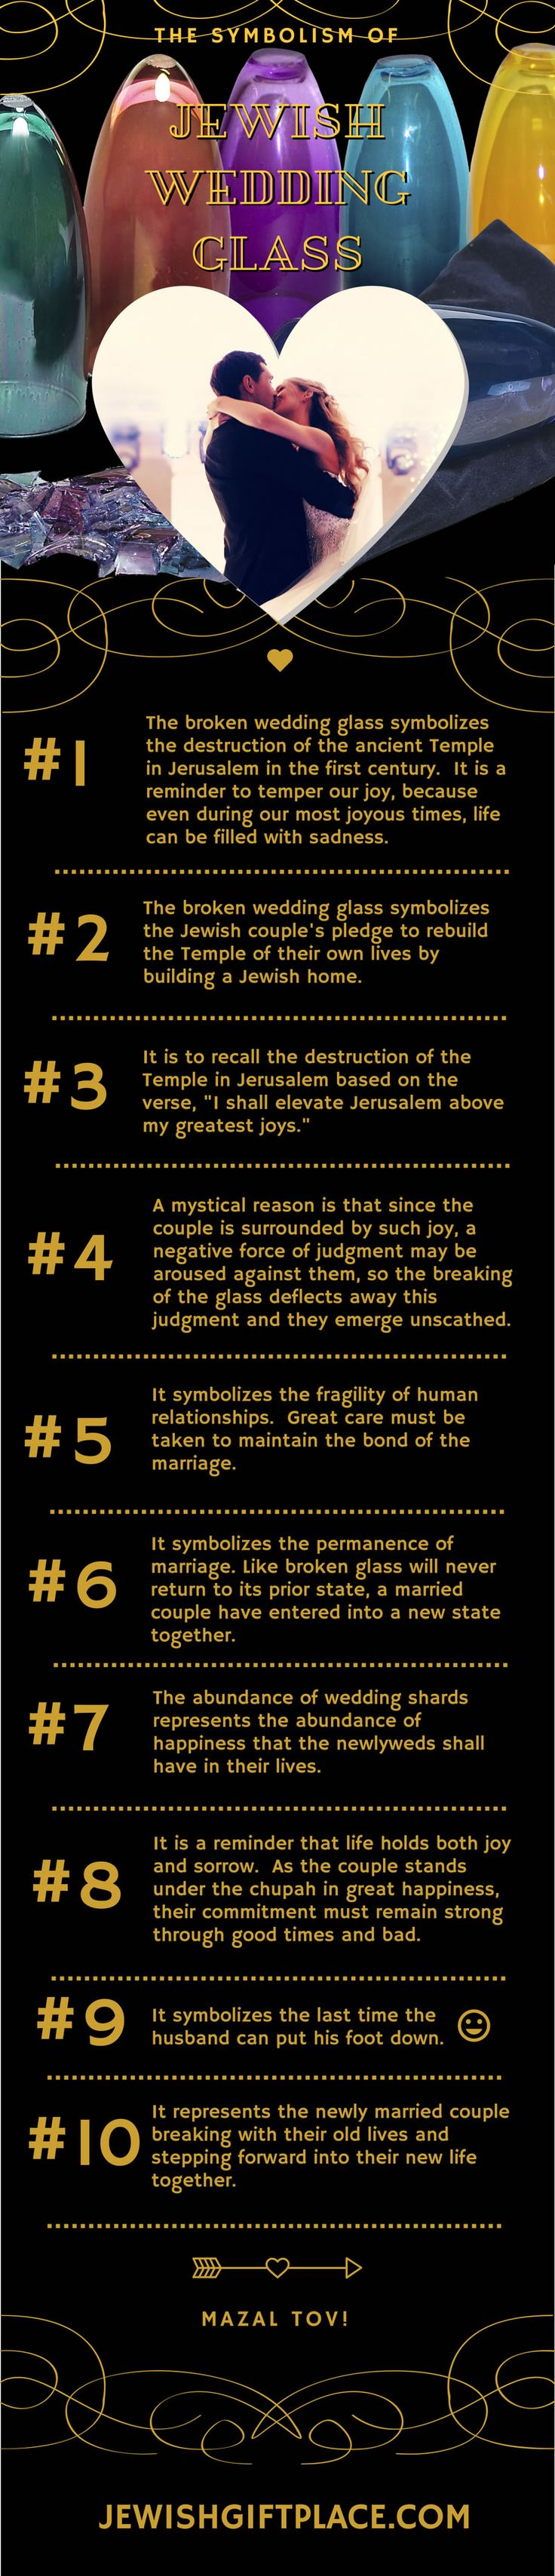 The Symbolism of Jewish Wedding Glass